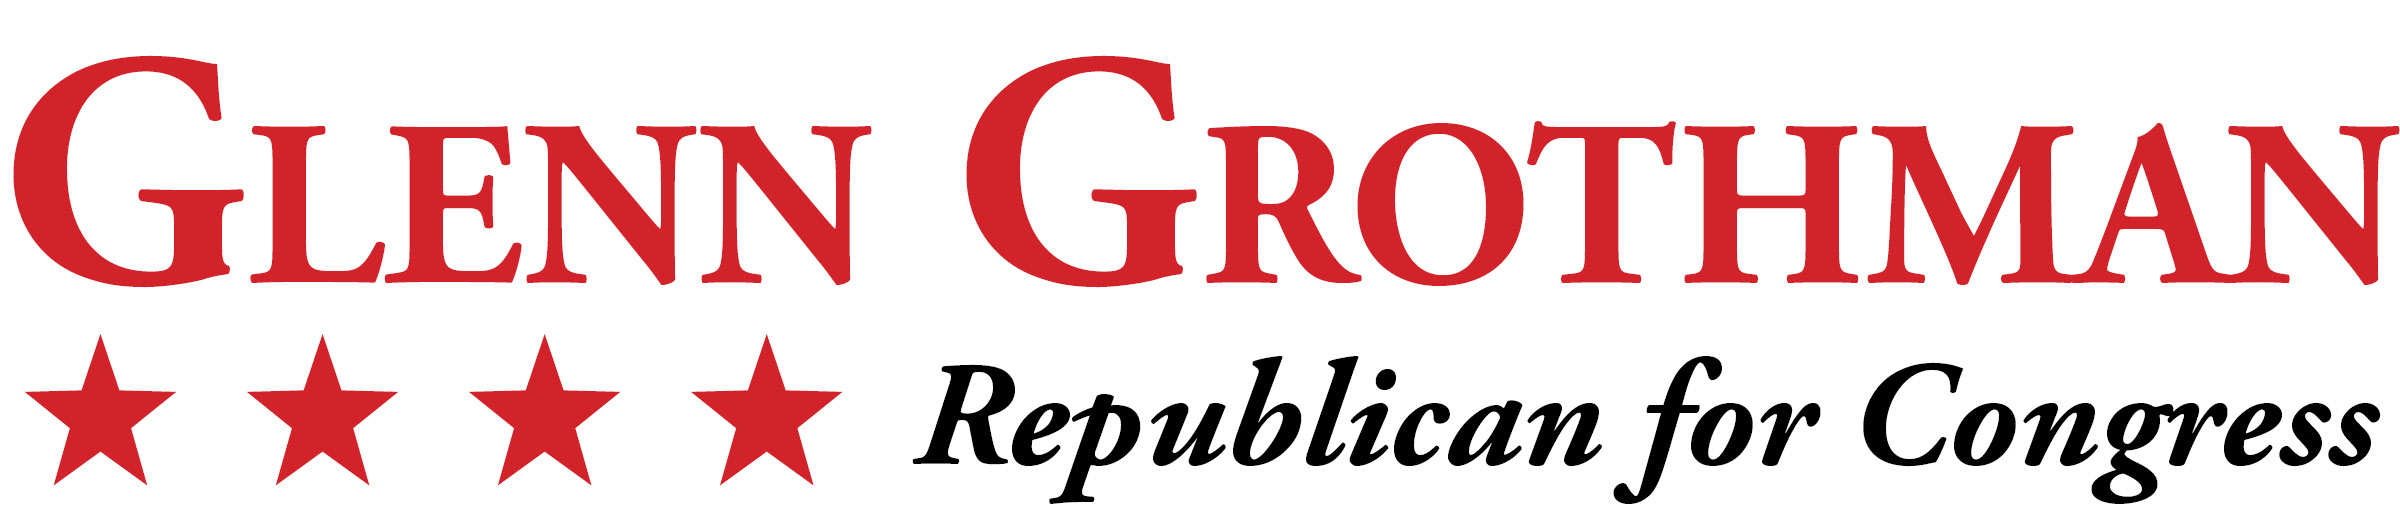 Glenn Grothman - Republican for Congress